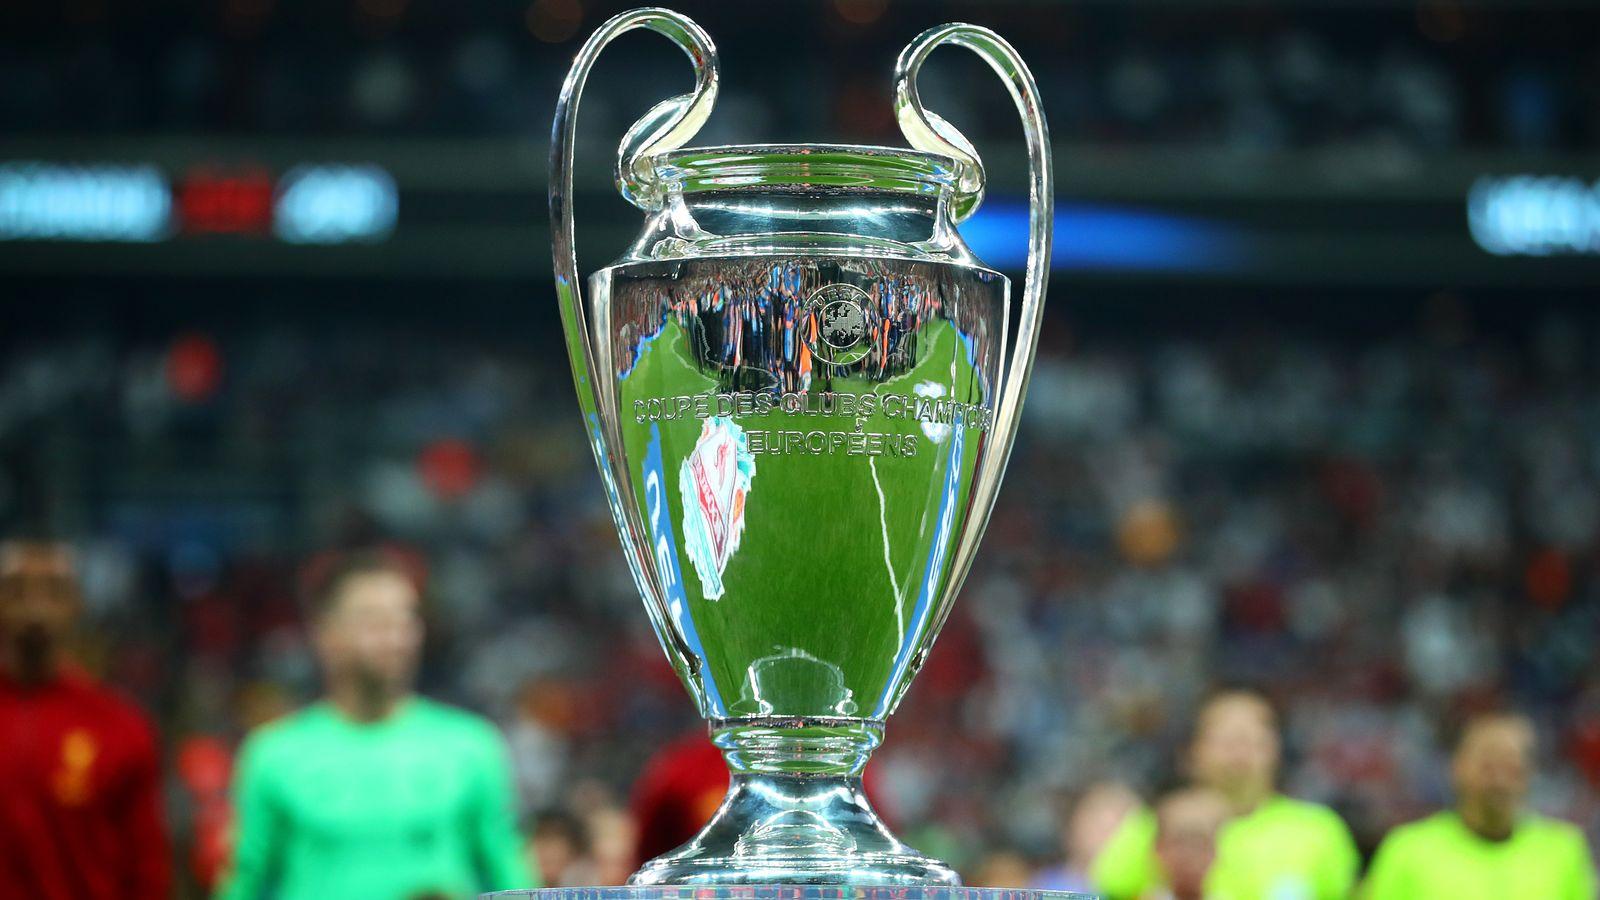 skysports-champions-league_4861512.jpg?20200313100934